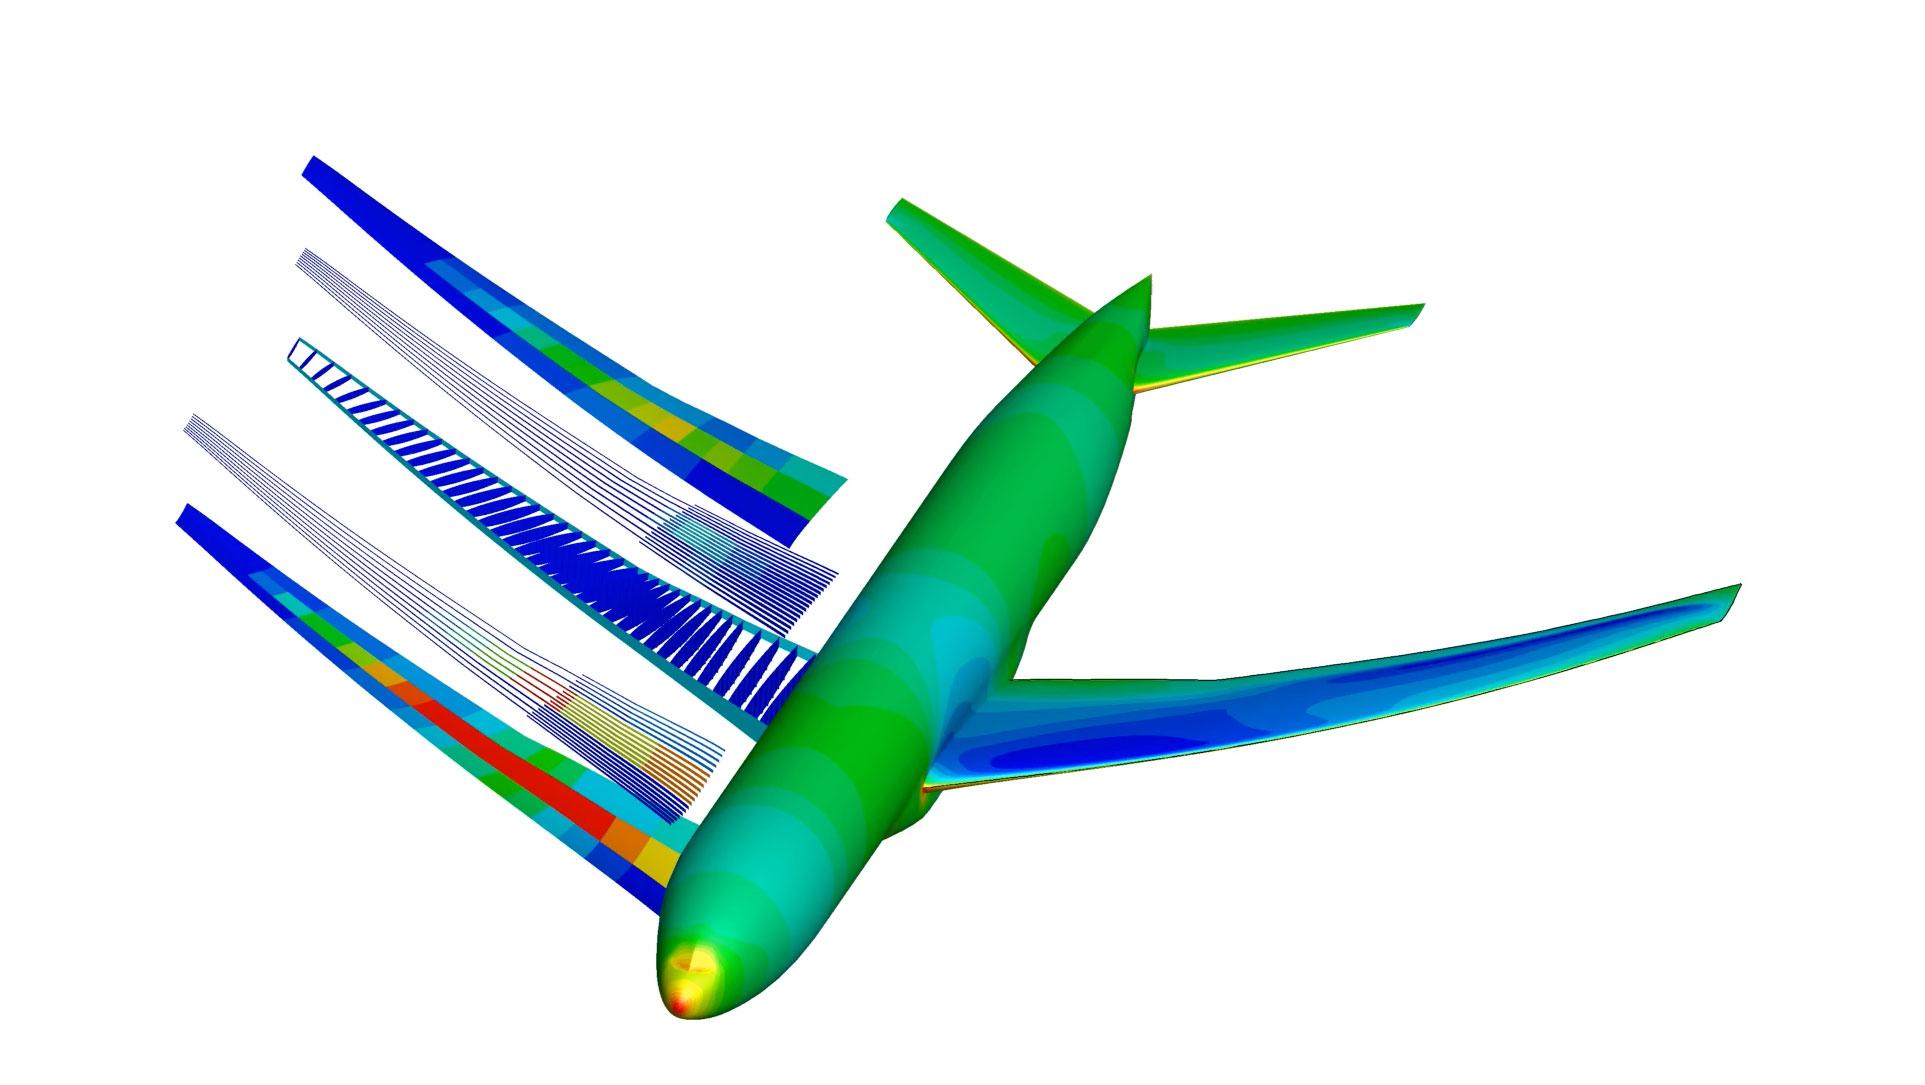 Simulation image of an optimized aircraft.